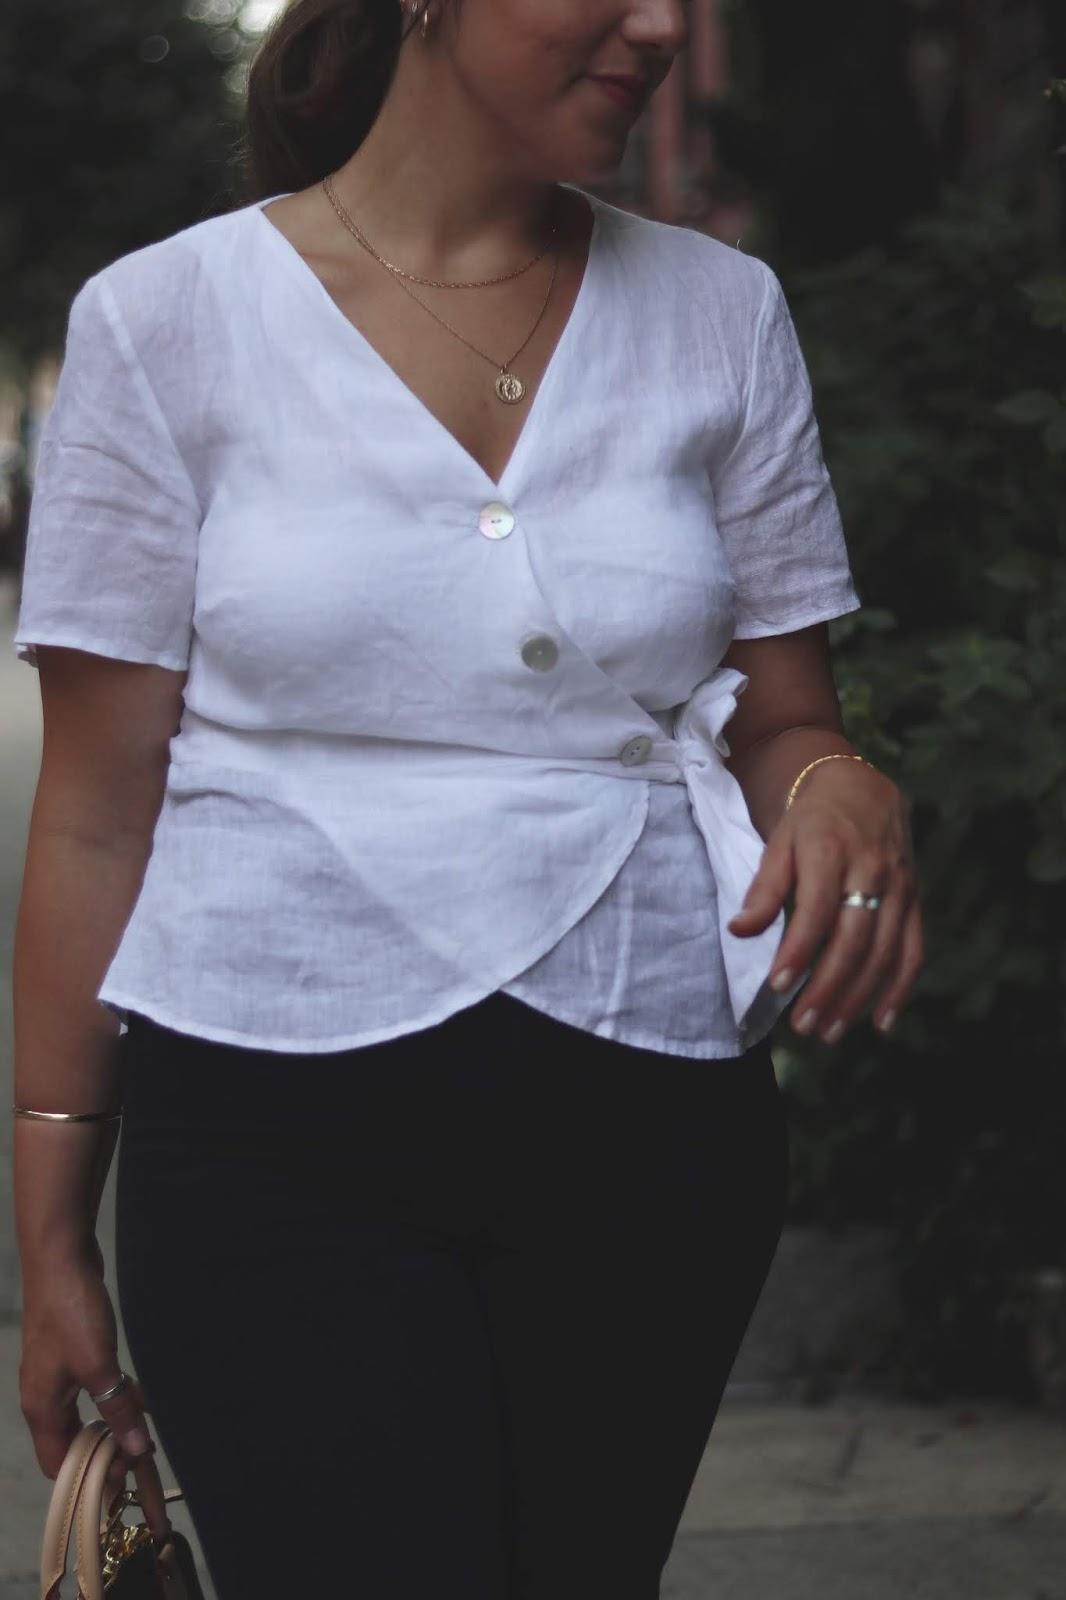 linen shirt outfit levis ribcage outfit louis vuitton bb alma